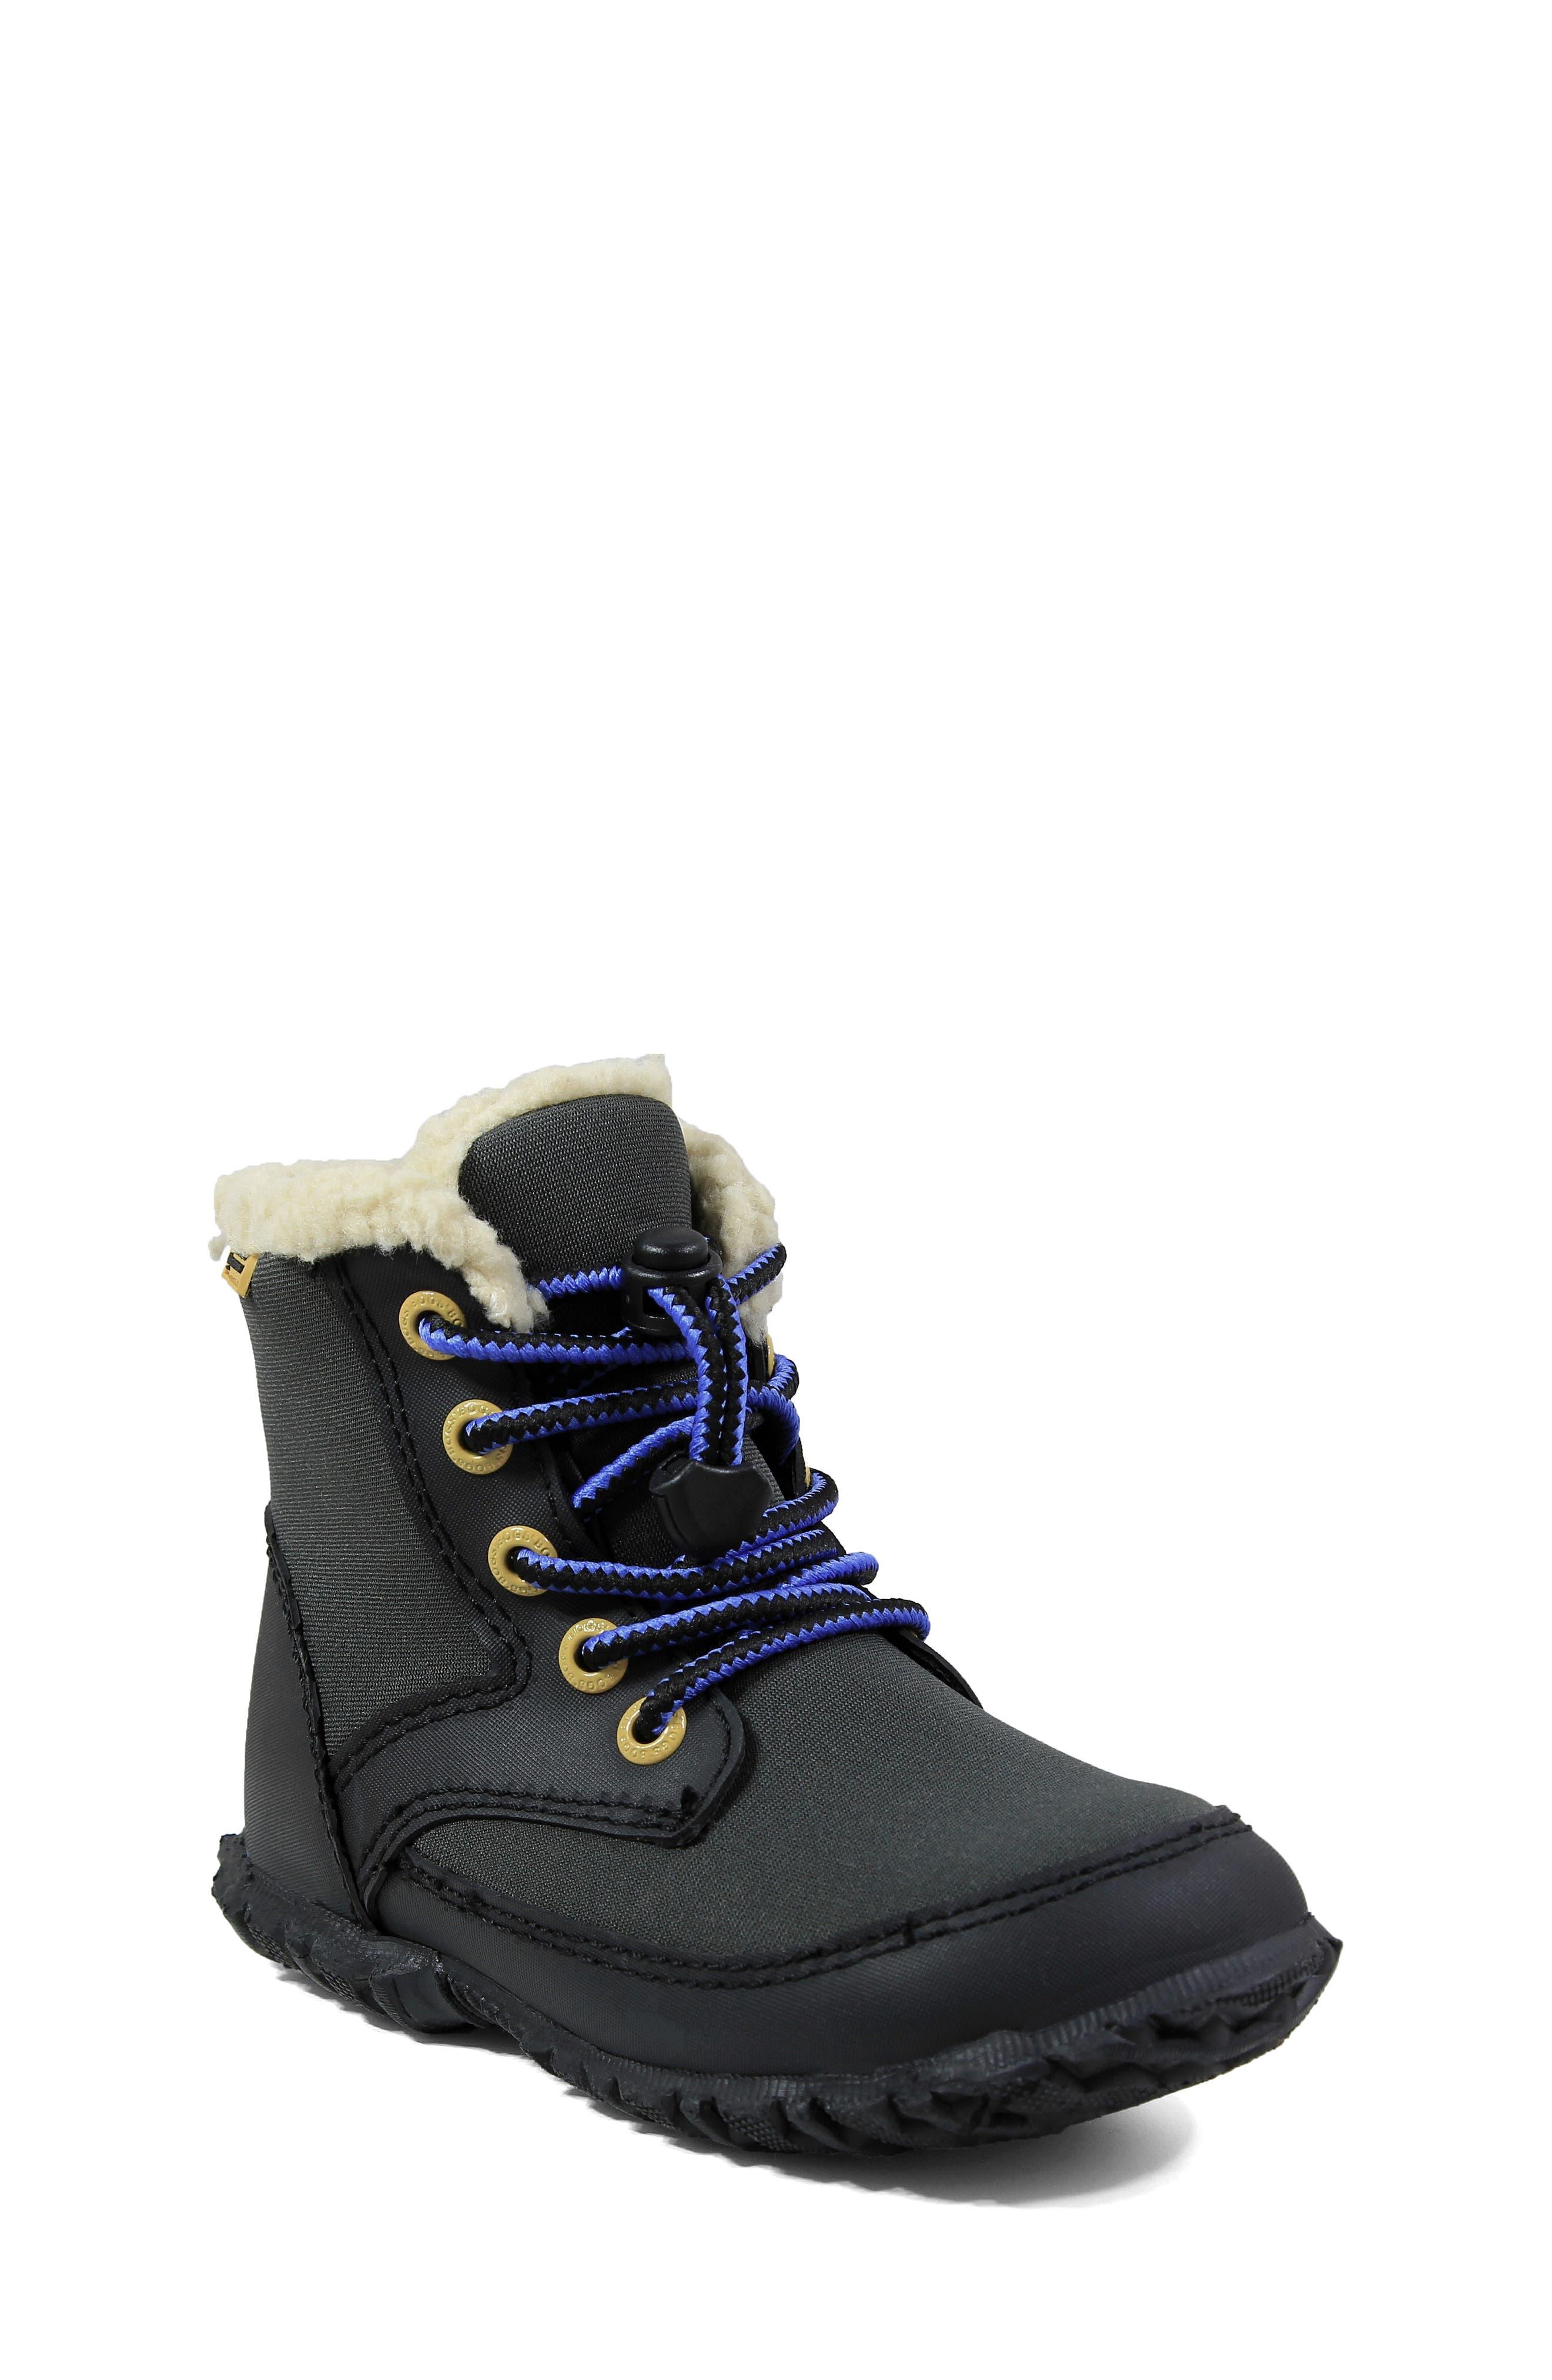 Bogs Skyler Faux Fur Insulated Waterproof Boot